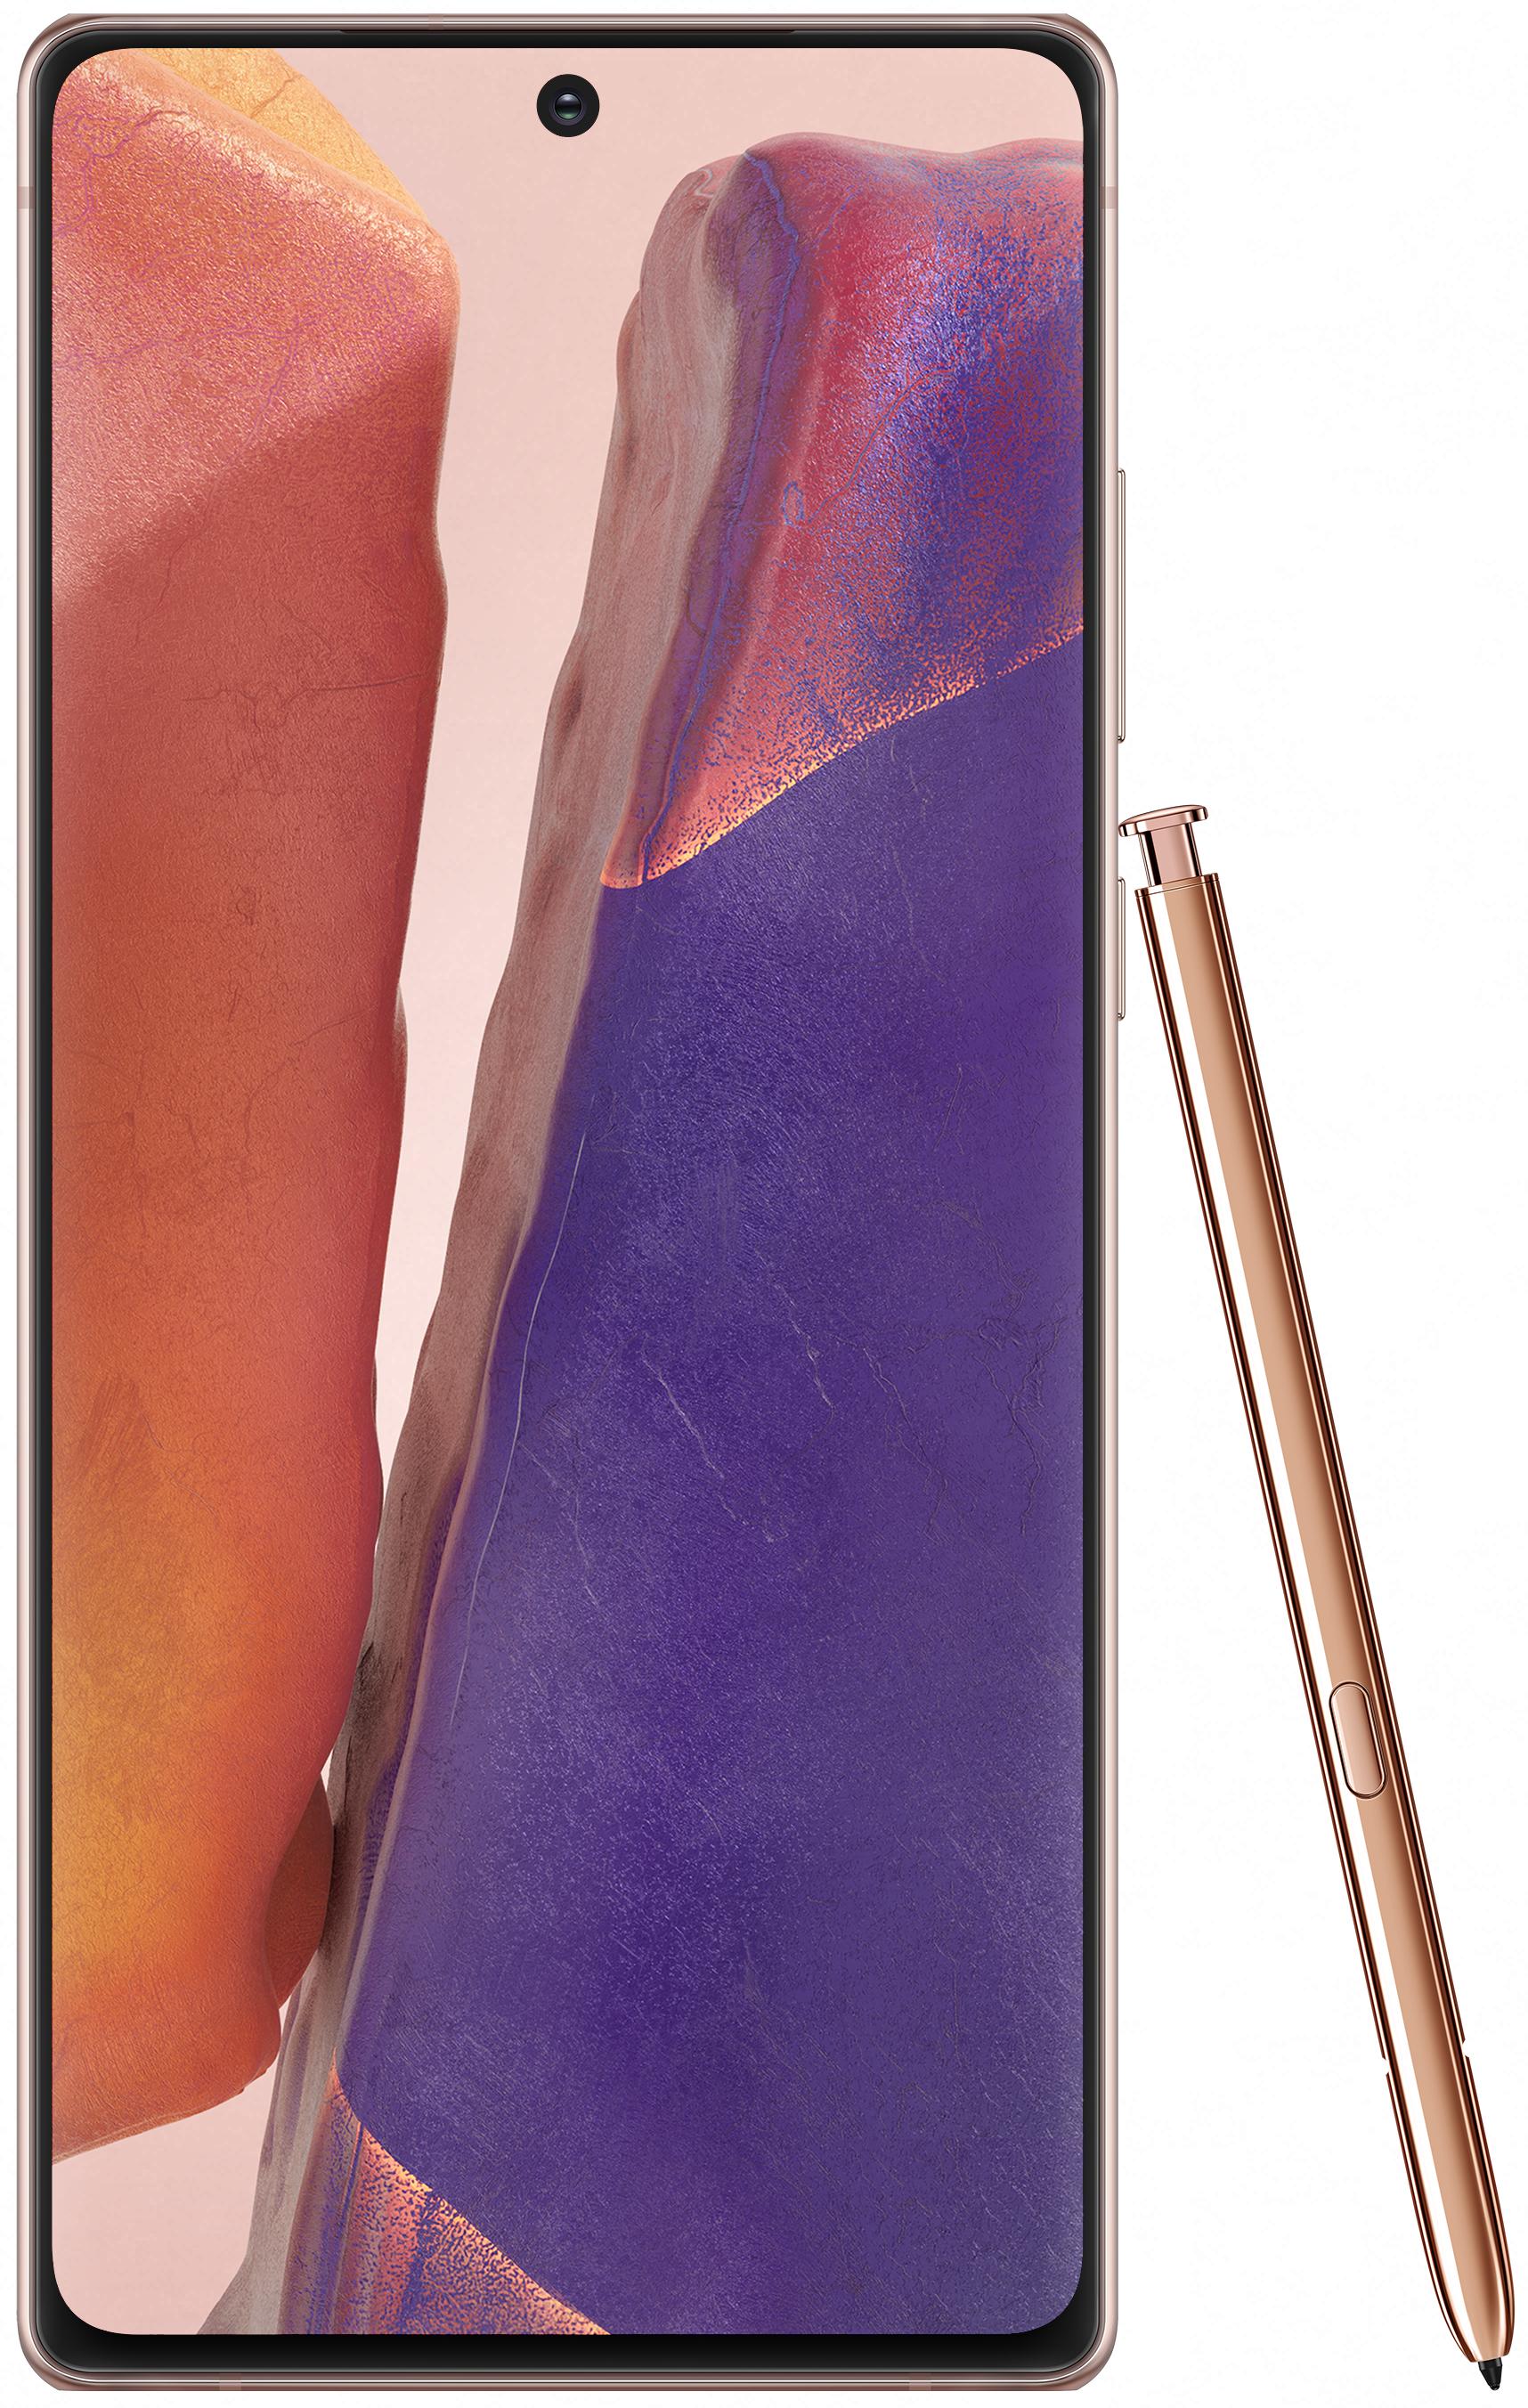 Smartphone Galaxy Note 20 5G 256 Go